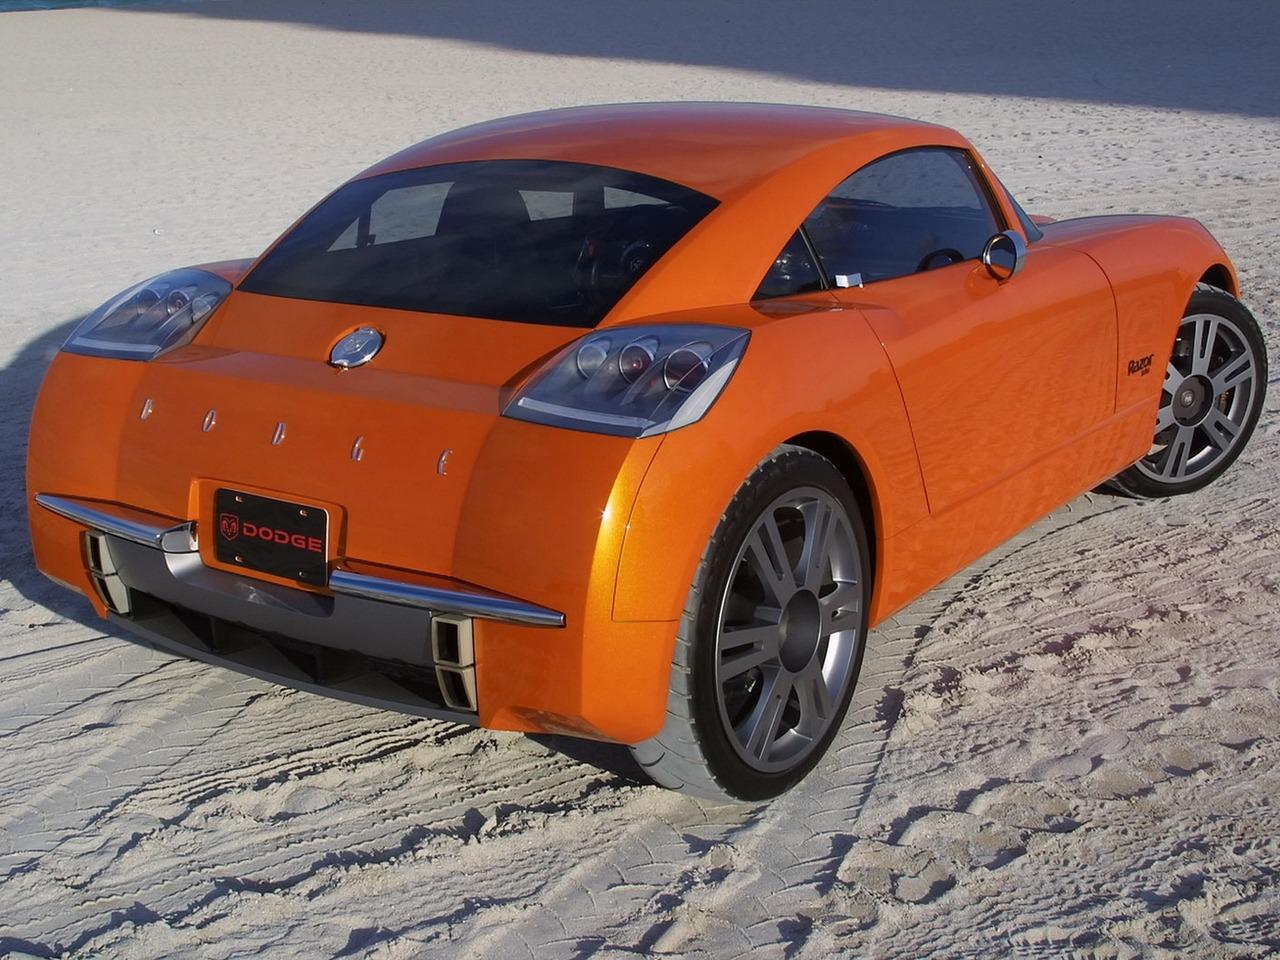 Subaru Dealer Near Me >> Dodge Razor Concept (2002) - Old Concept Cars